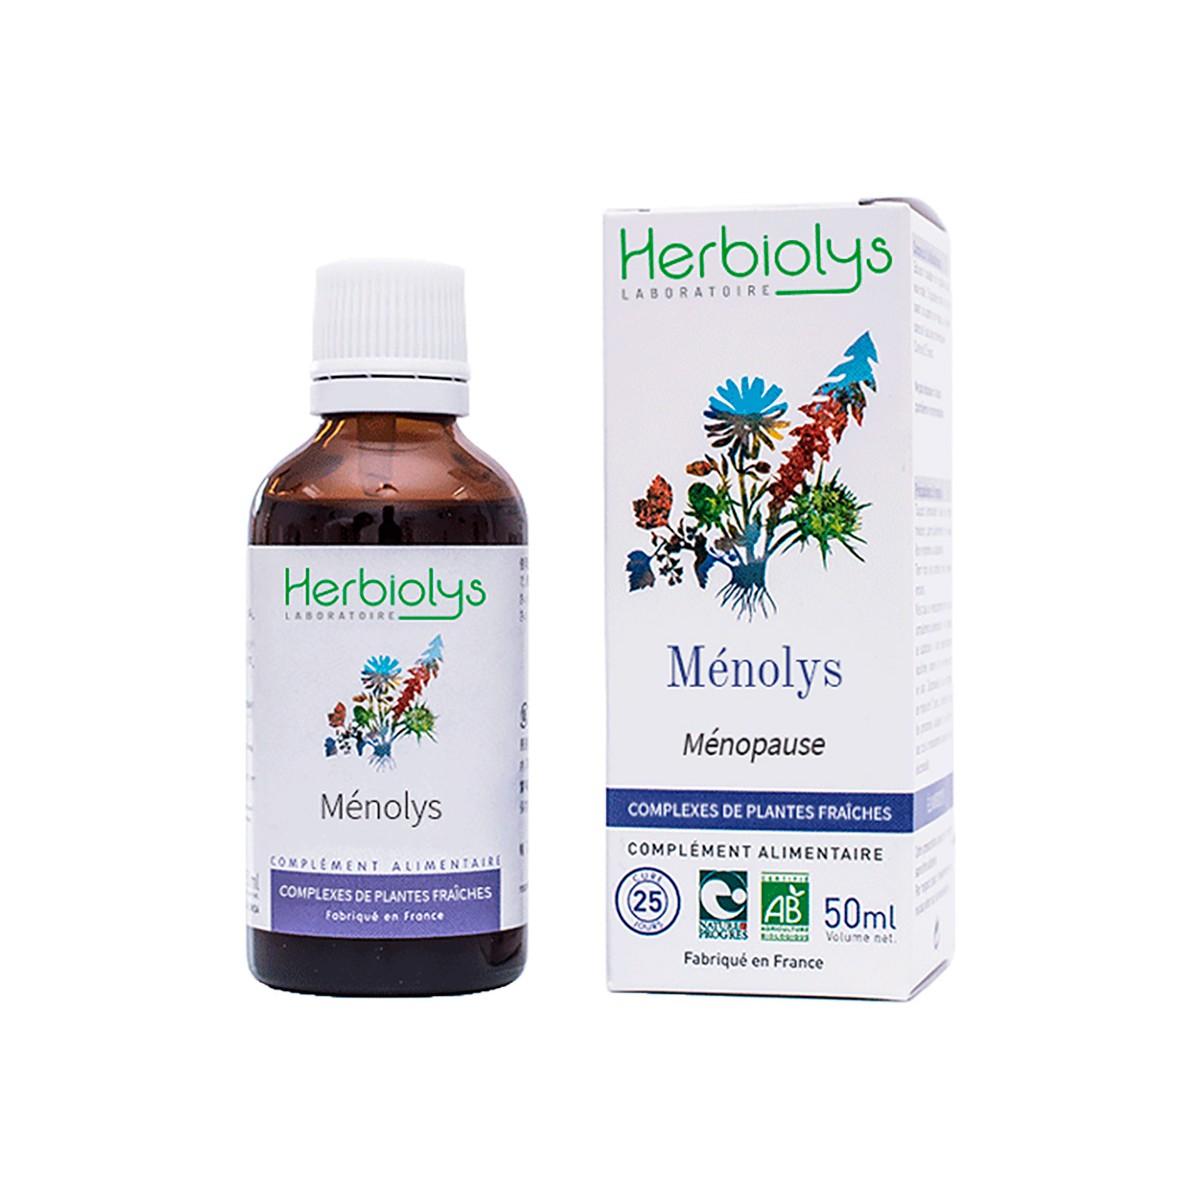 Ménolys - Synergie de plantes et bourgeons BIO Ménopause